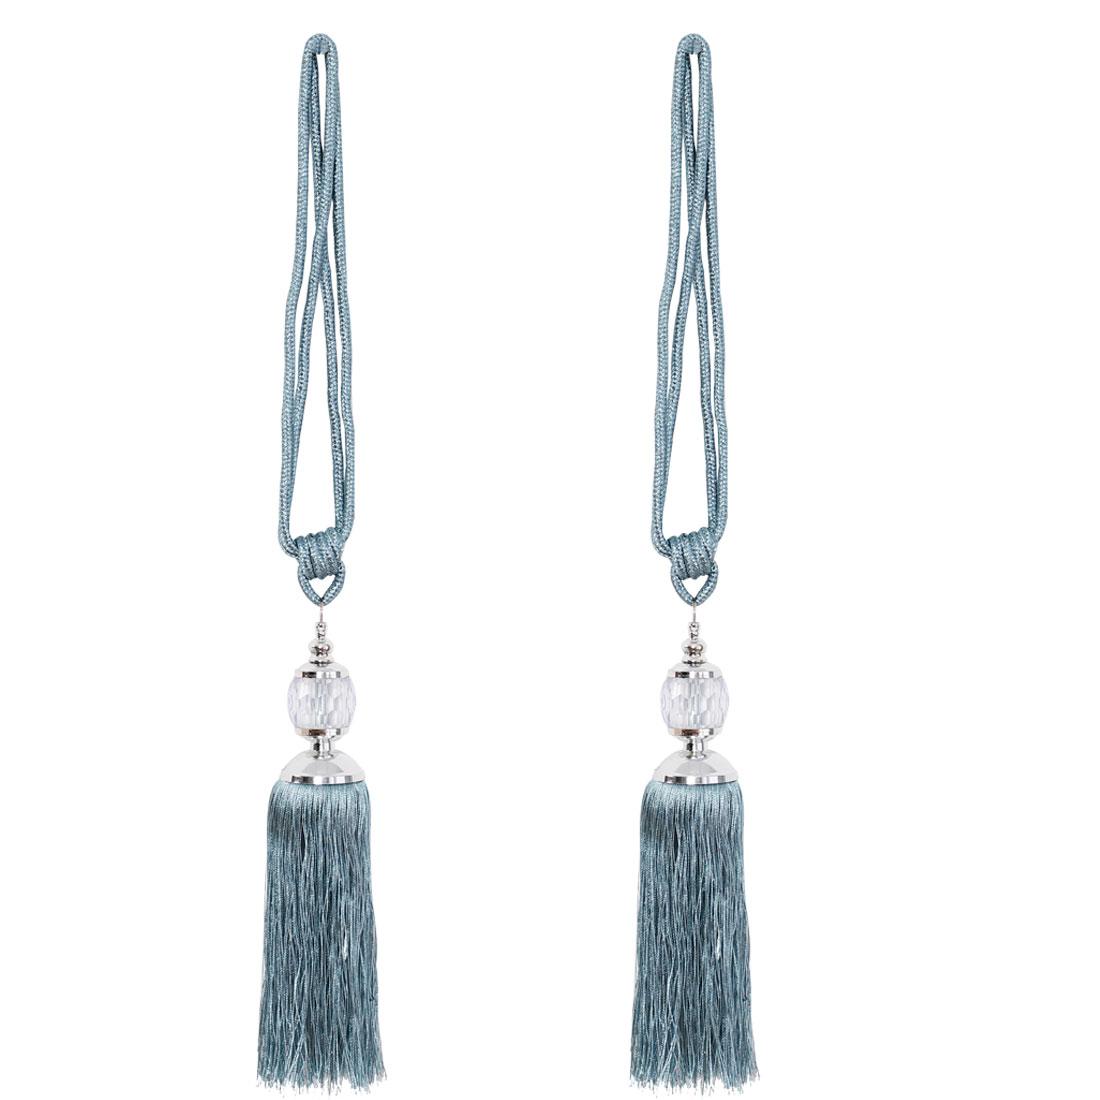 "Tassel Curtain Tieback 24.8"" Holdback Decorative Rope Curtain 2pcs, Blue"